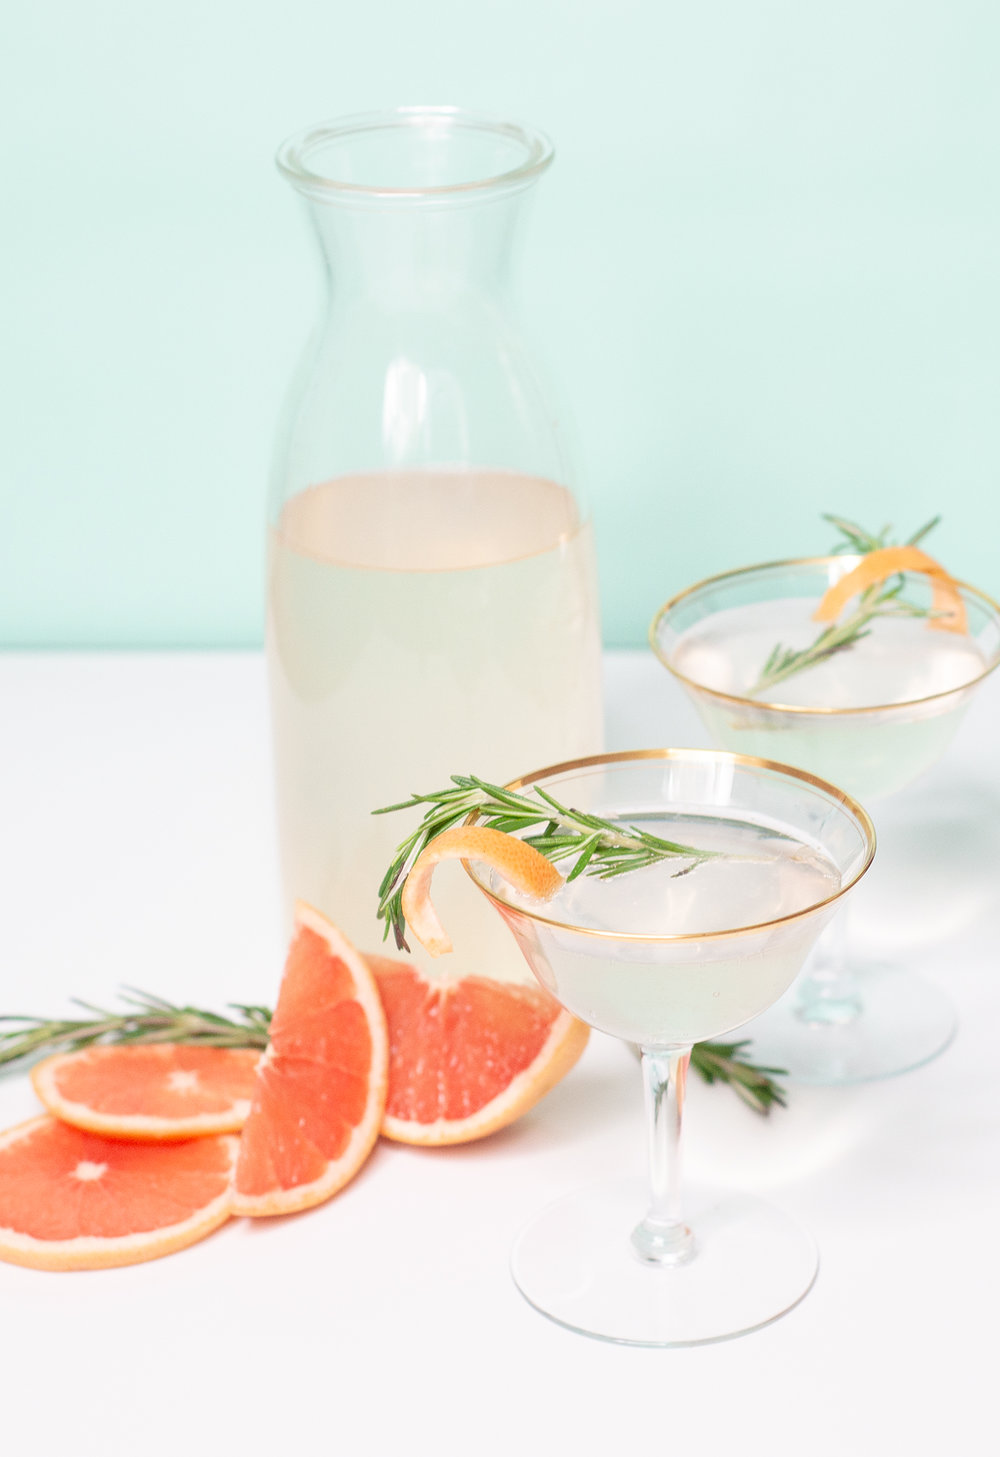 Grapefruit Elderberry Cocktail for Easter Brunch